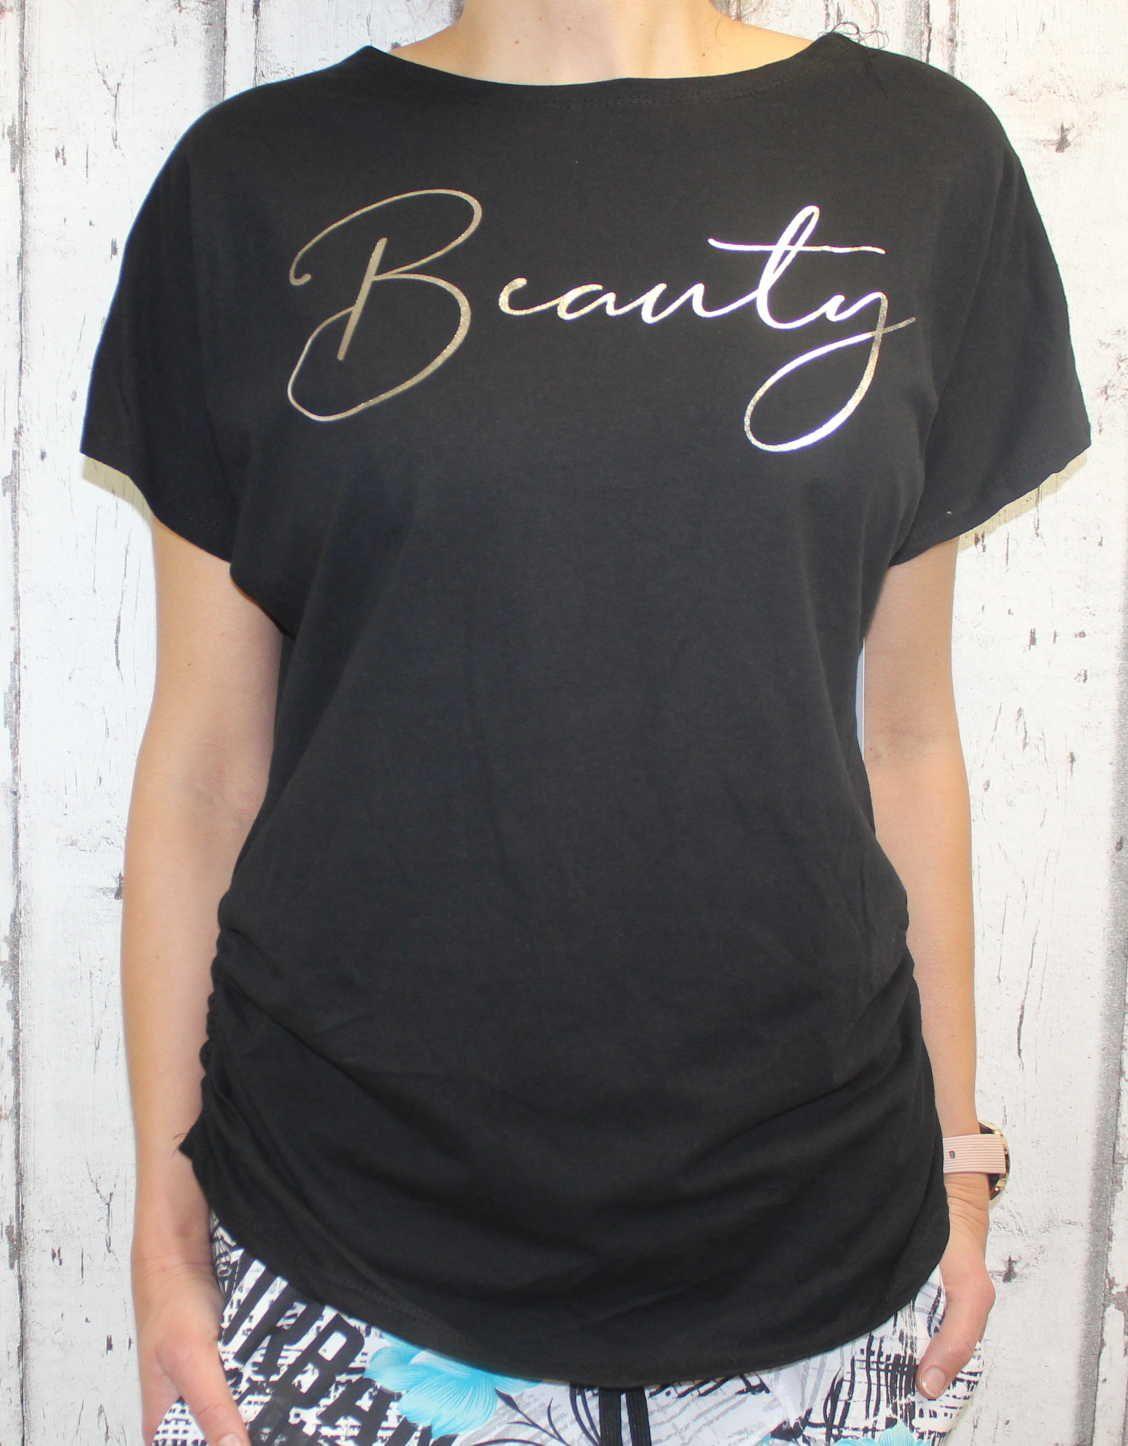 Dámské tričko krátký rukáv, tričko spadlá ramena, dámské volné triko, pohodlné dámské tričko, dámská tunika, volné tričko přes břicho, tričko s rantlem, černé volné tričko s nařasením na bocích Italy Moda